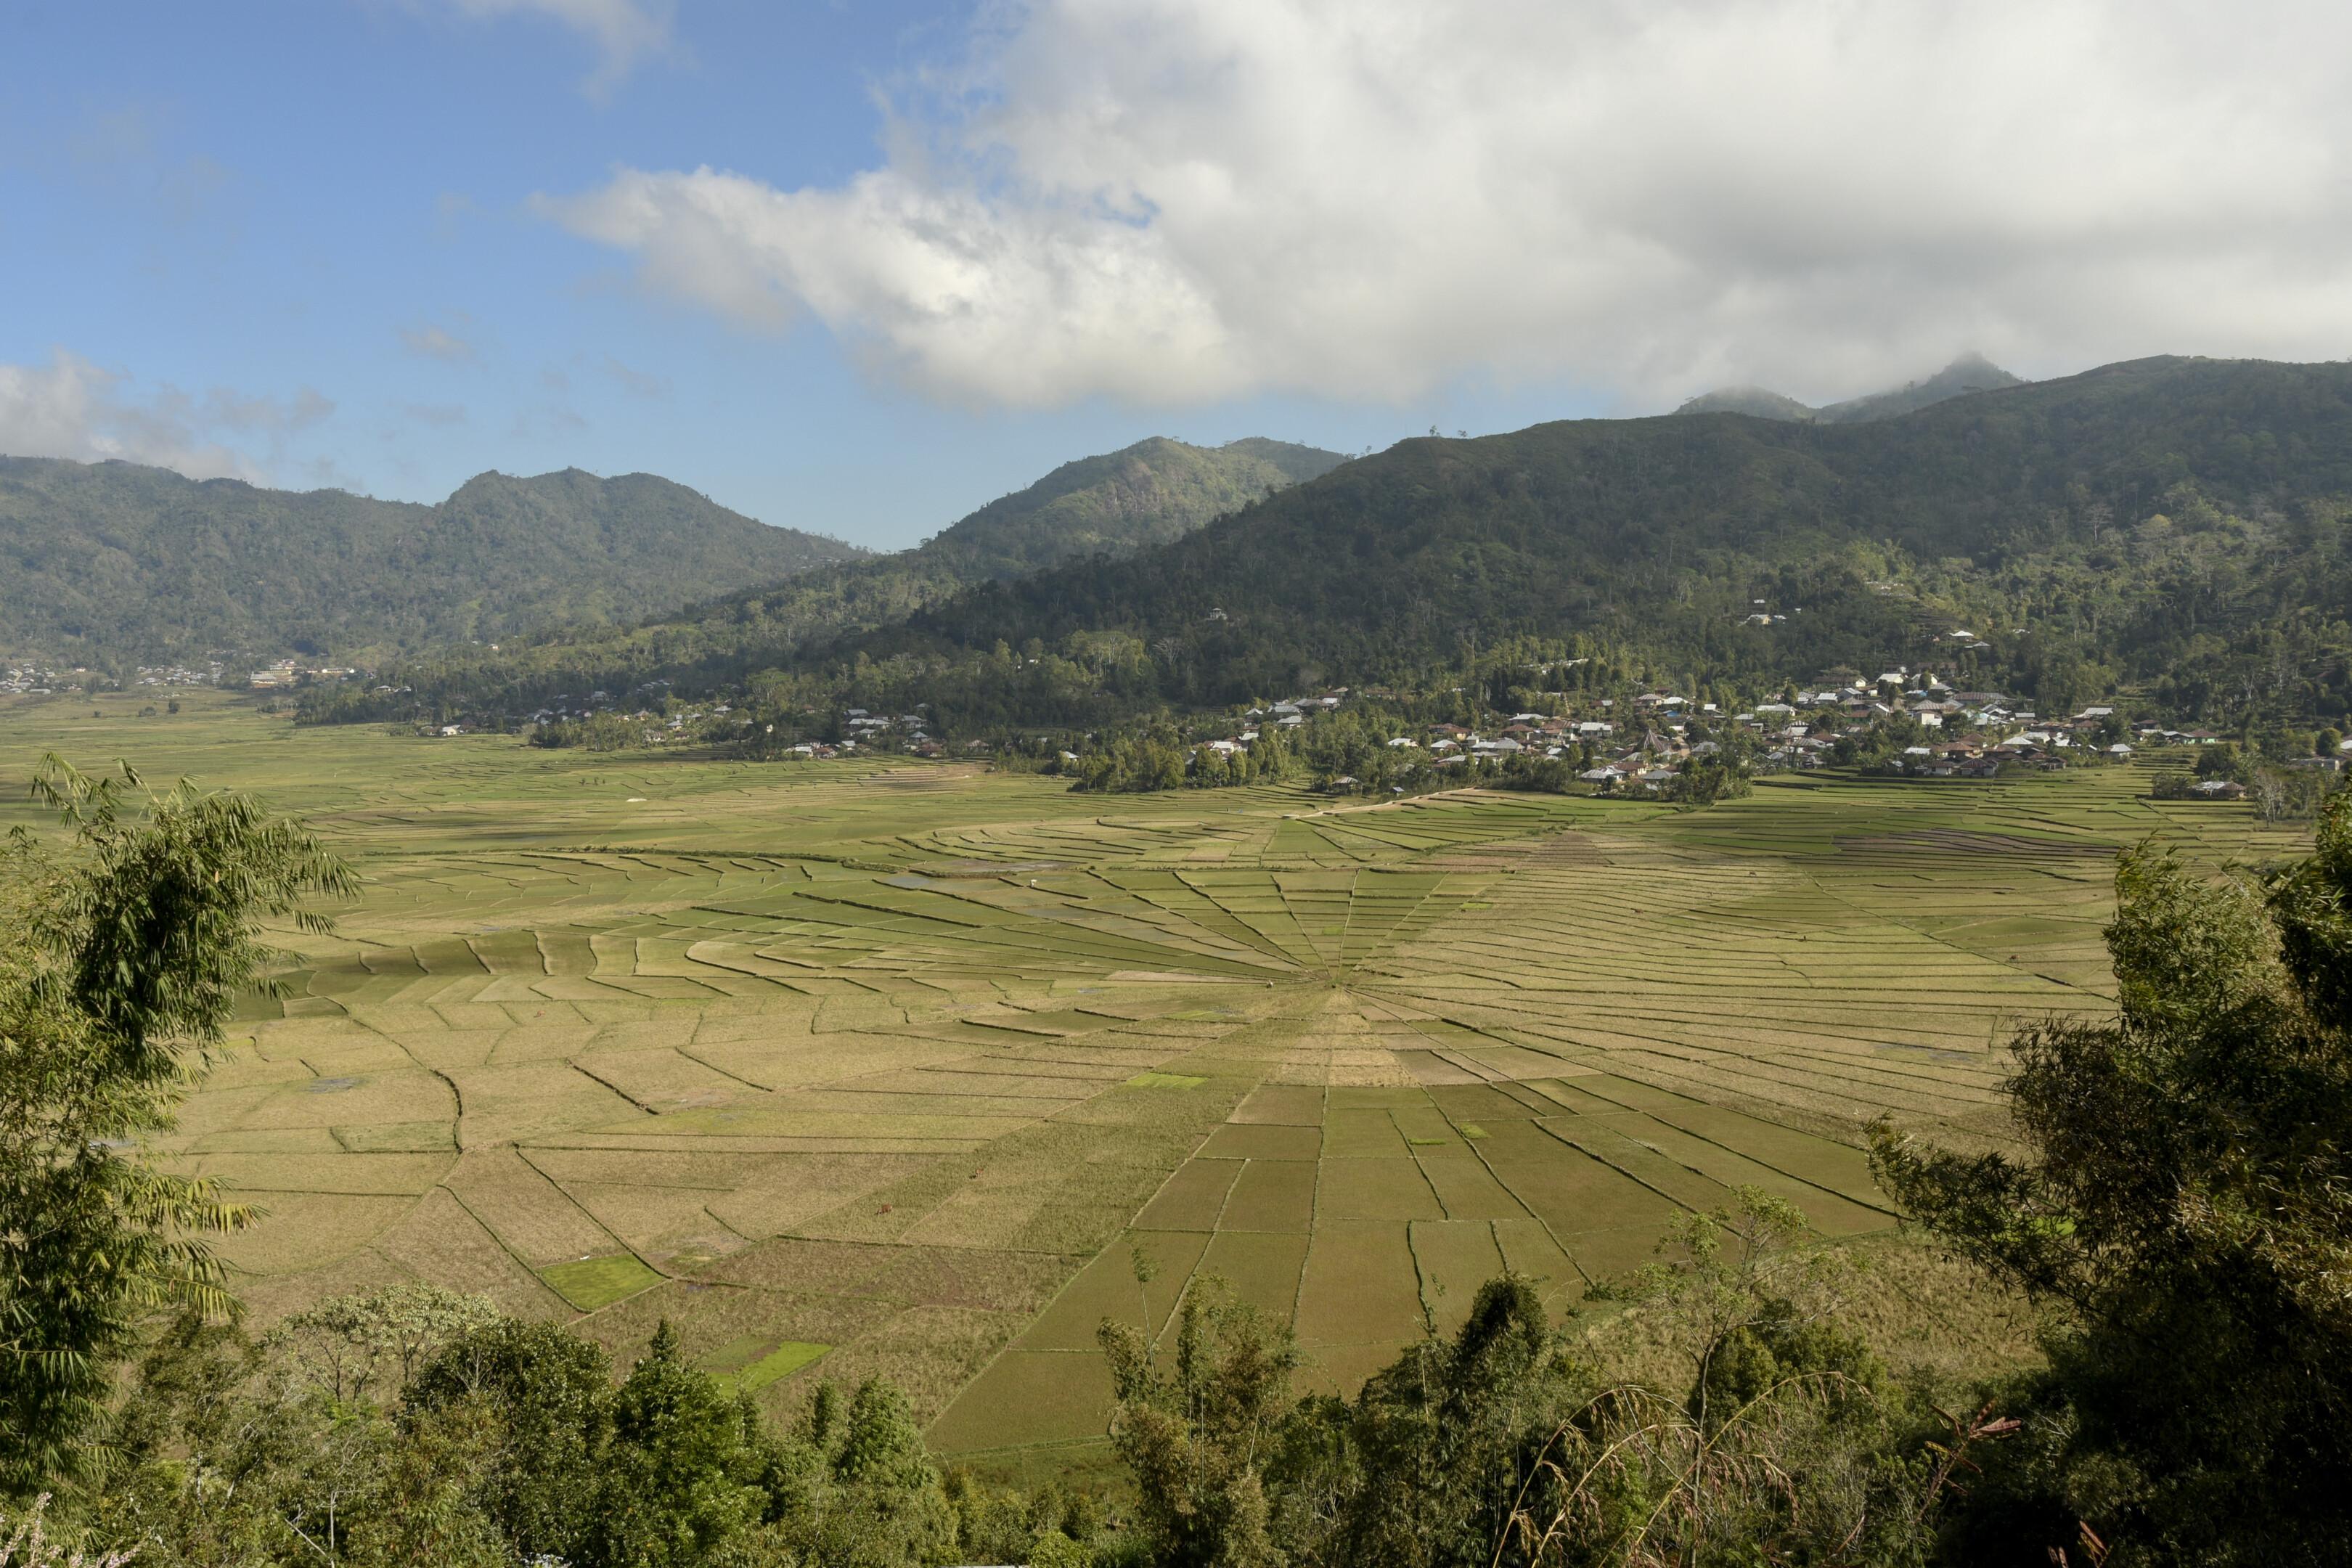 Spider Web Rice Fields, Flores Indonesië